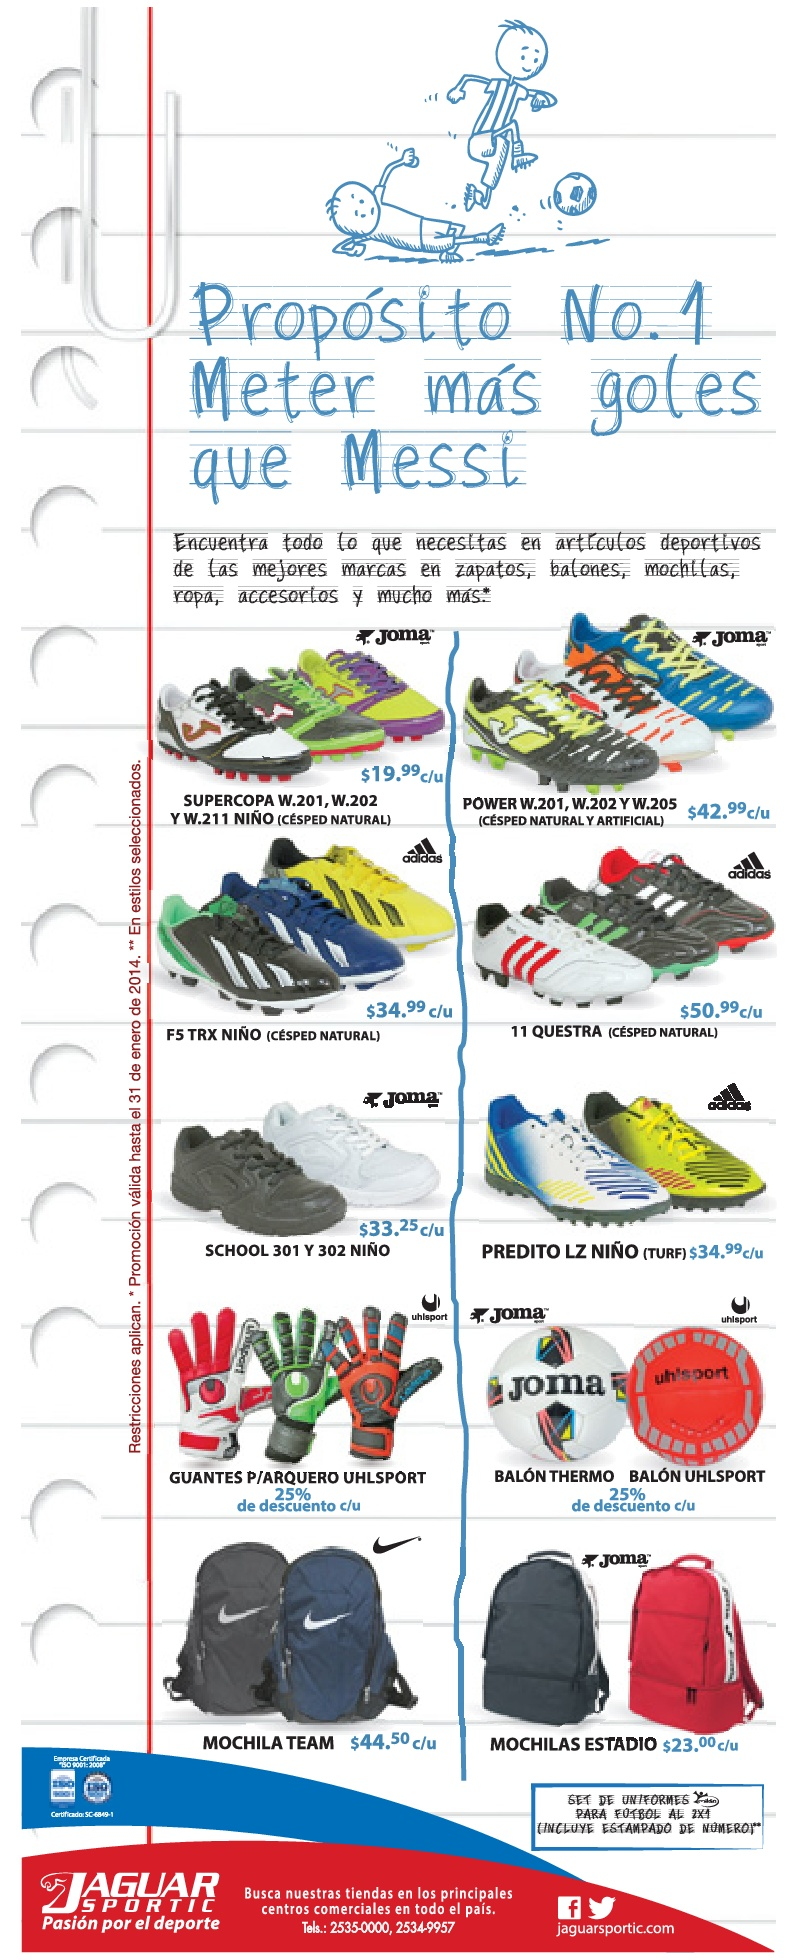 zapatos joma en guatemala ni�as